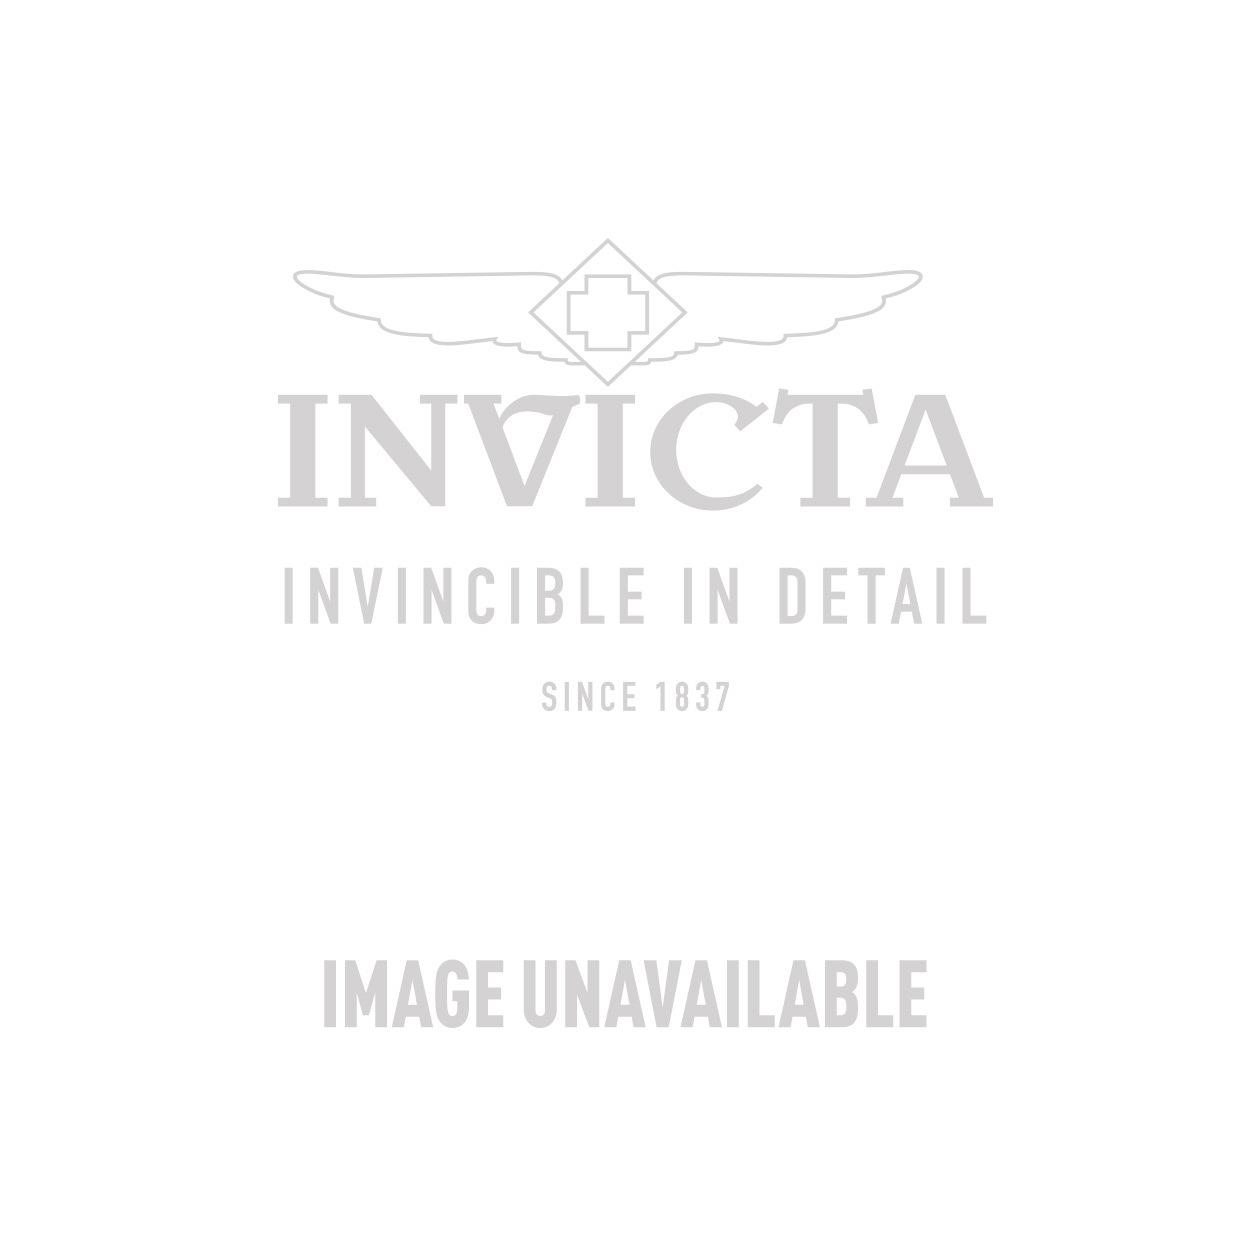 Invicta Corduba Swiss Made Quartz Watch - Gold case with Dark Green tone Polyurethane band - Model 90230